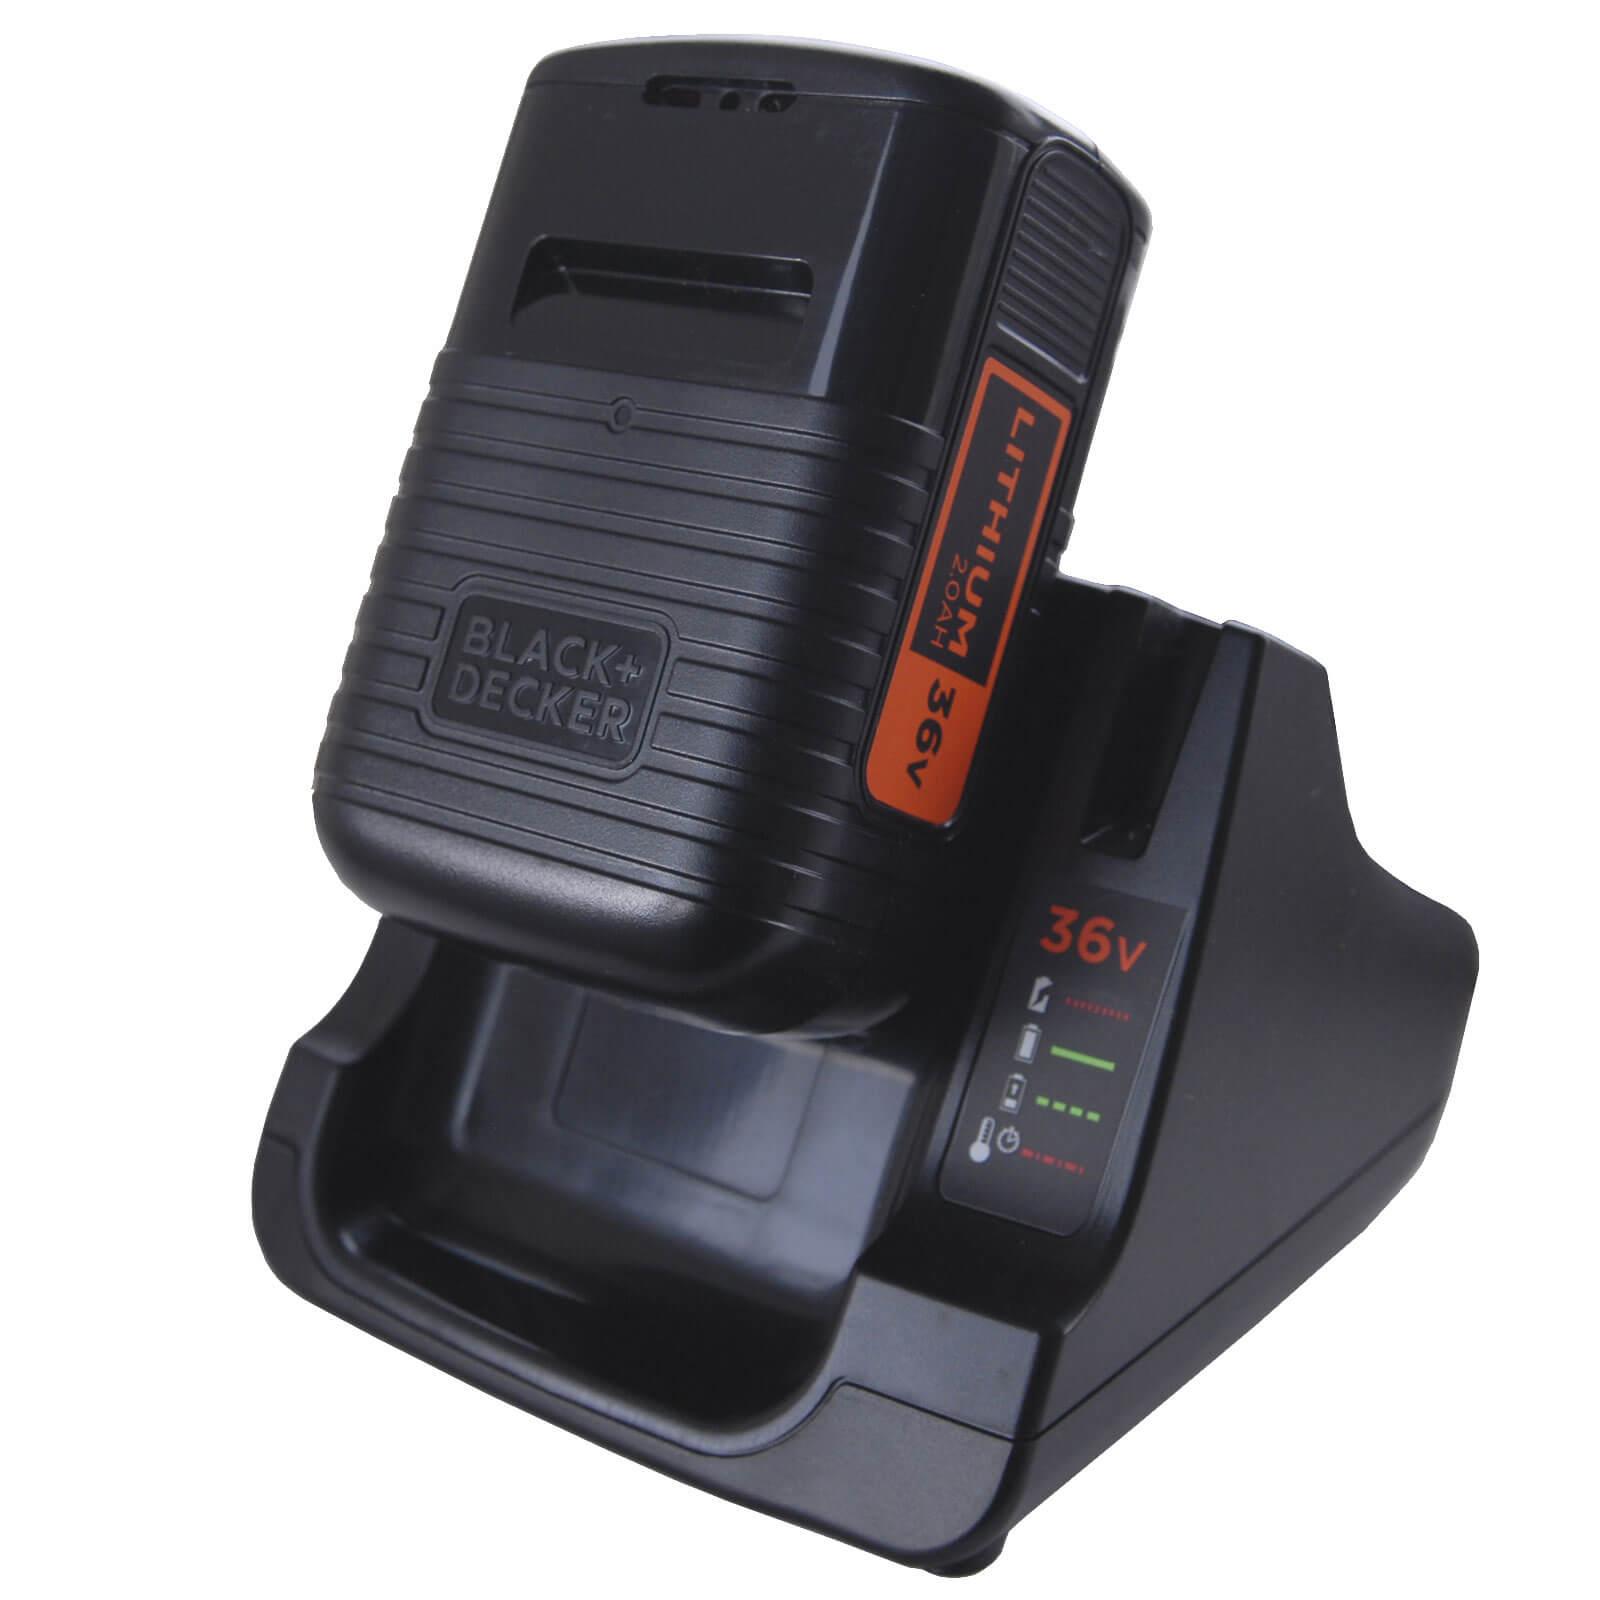 Image of Black & Decker BDC2A36 36v Cordless Battery Charger & Battery 2ah 240v